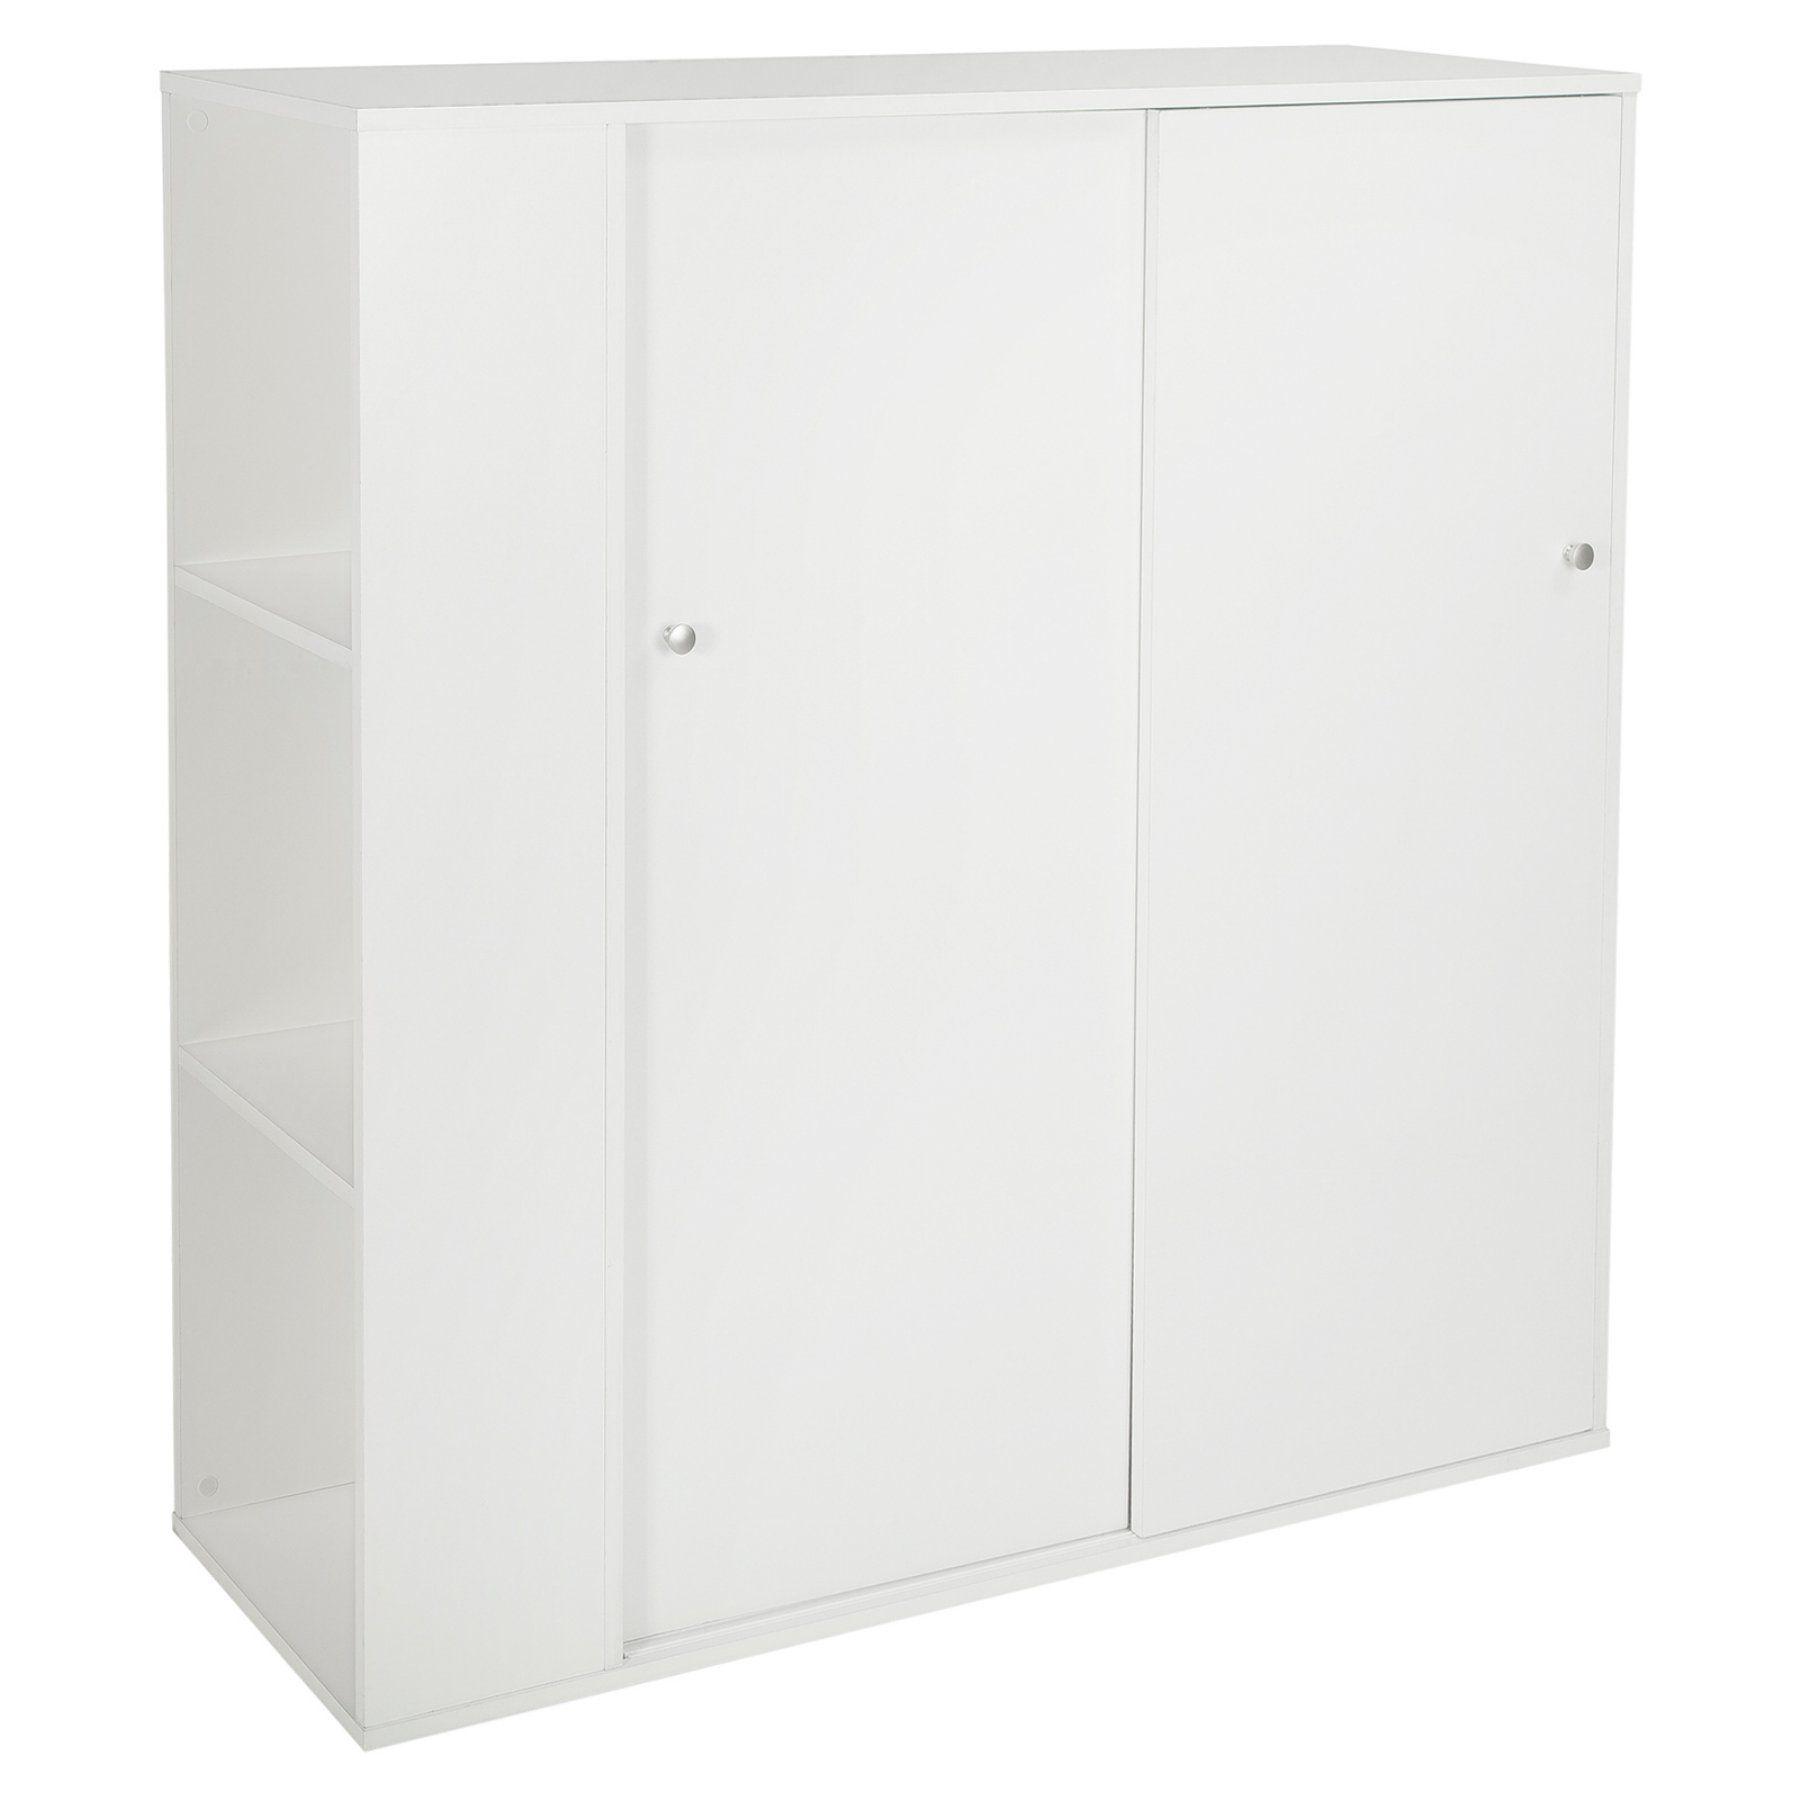 South Shore Storit Kids Storage Cabinet With Sliding Doors 5050047